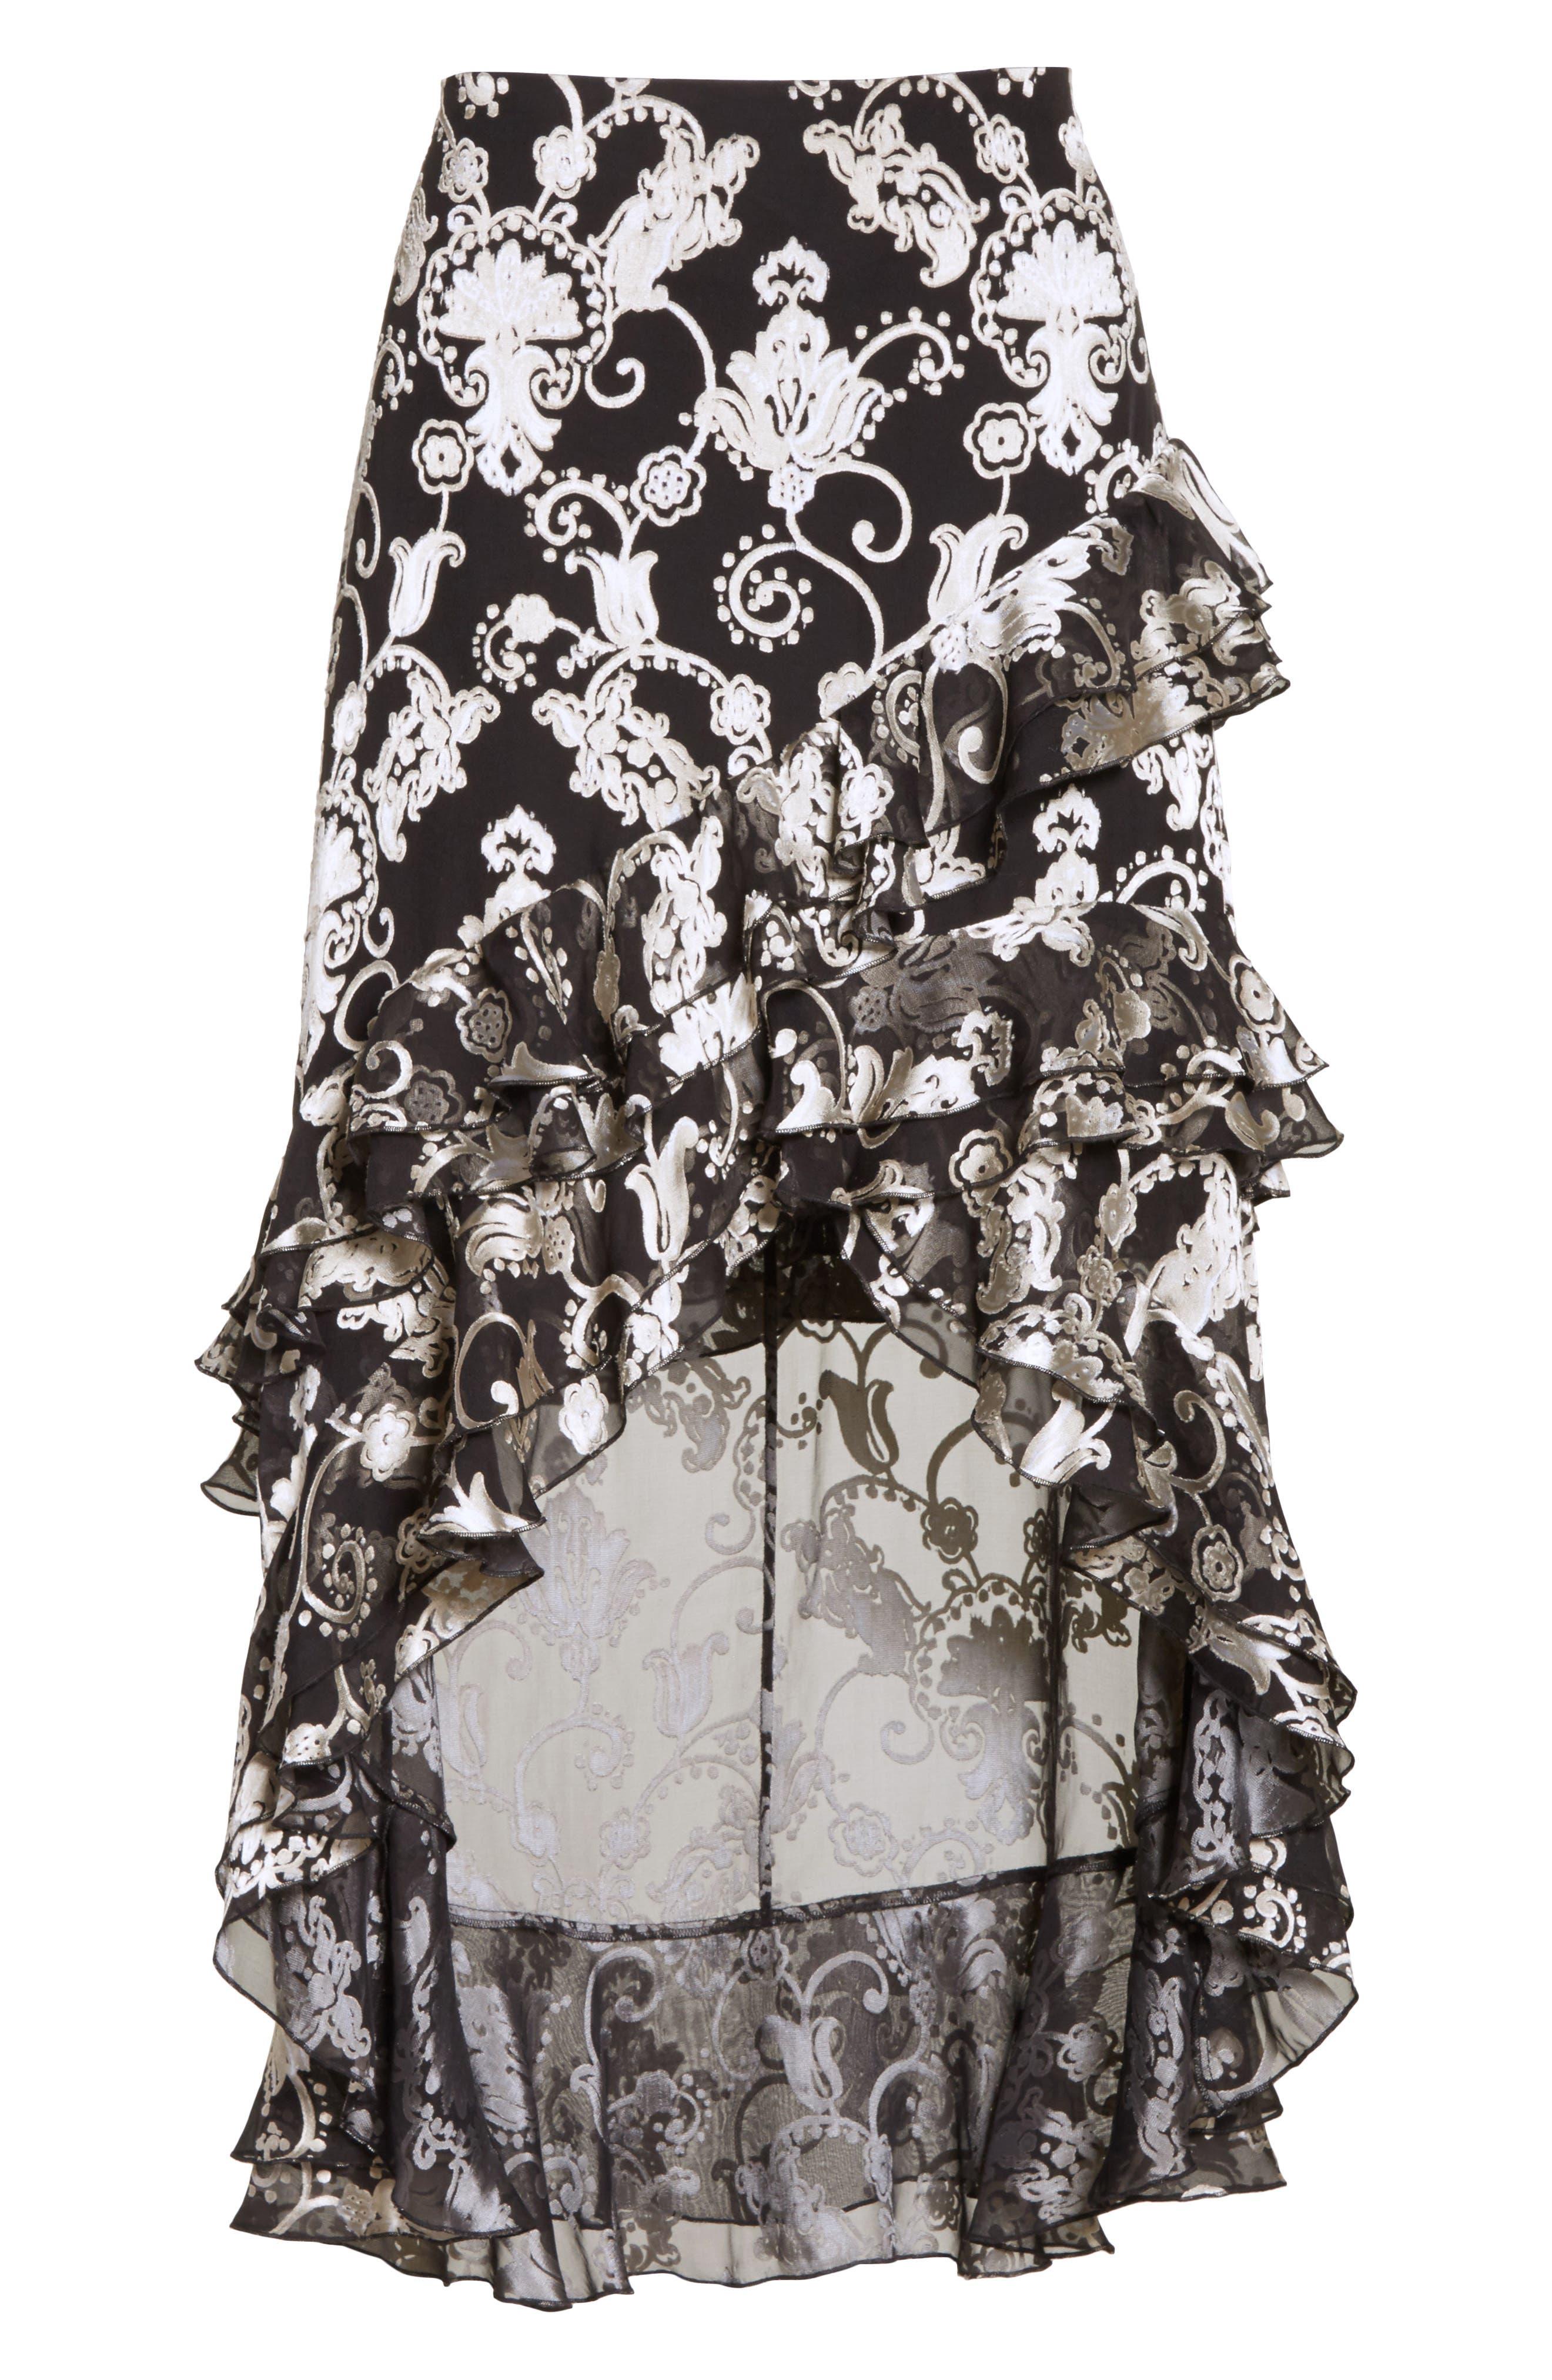 Sasha Asymmetrical Tiered Ruffle Skirt,                             Alternate thumbnail 7, color,                             Black/ White